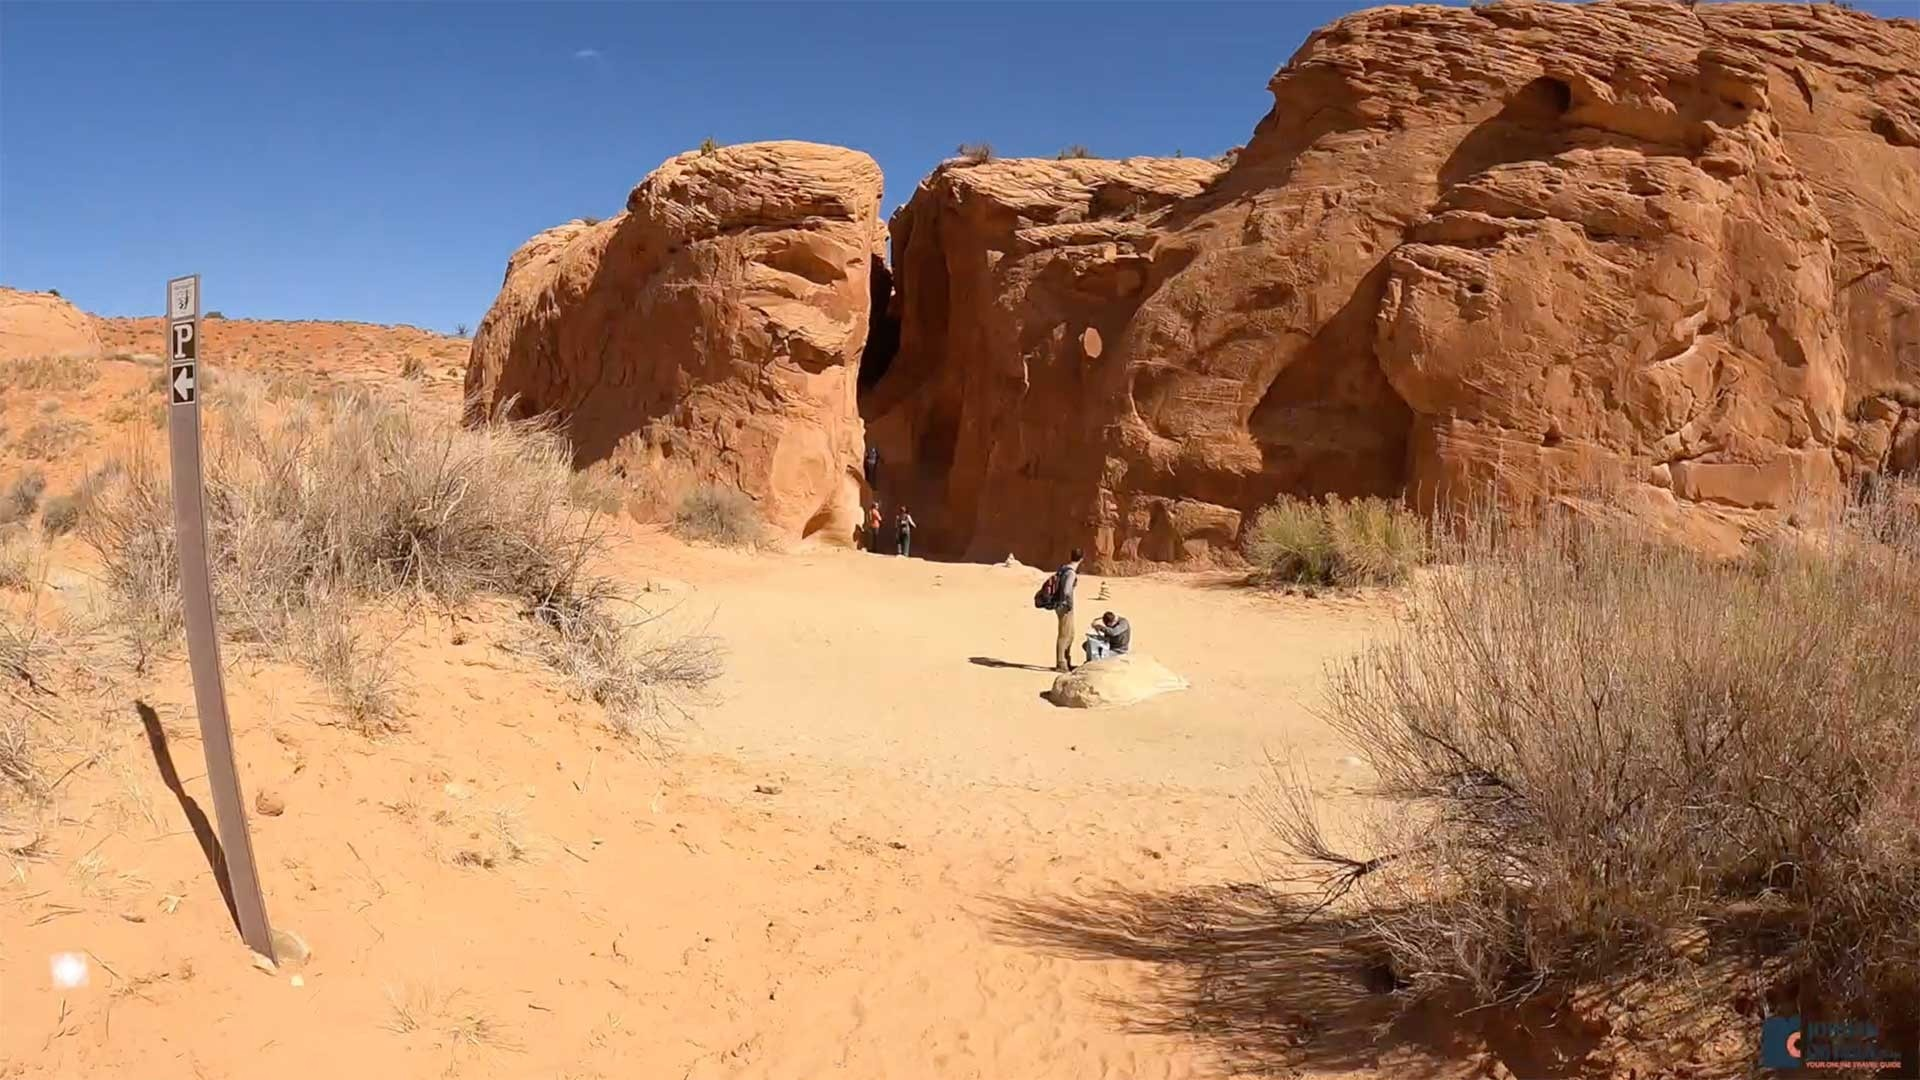 The Entrance to Peek-A-Boo Slot Canyon